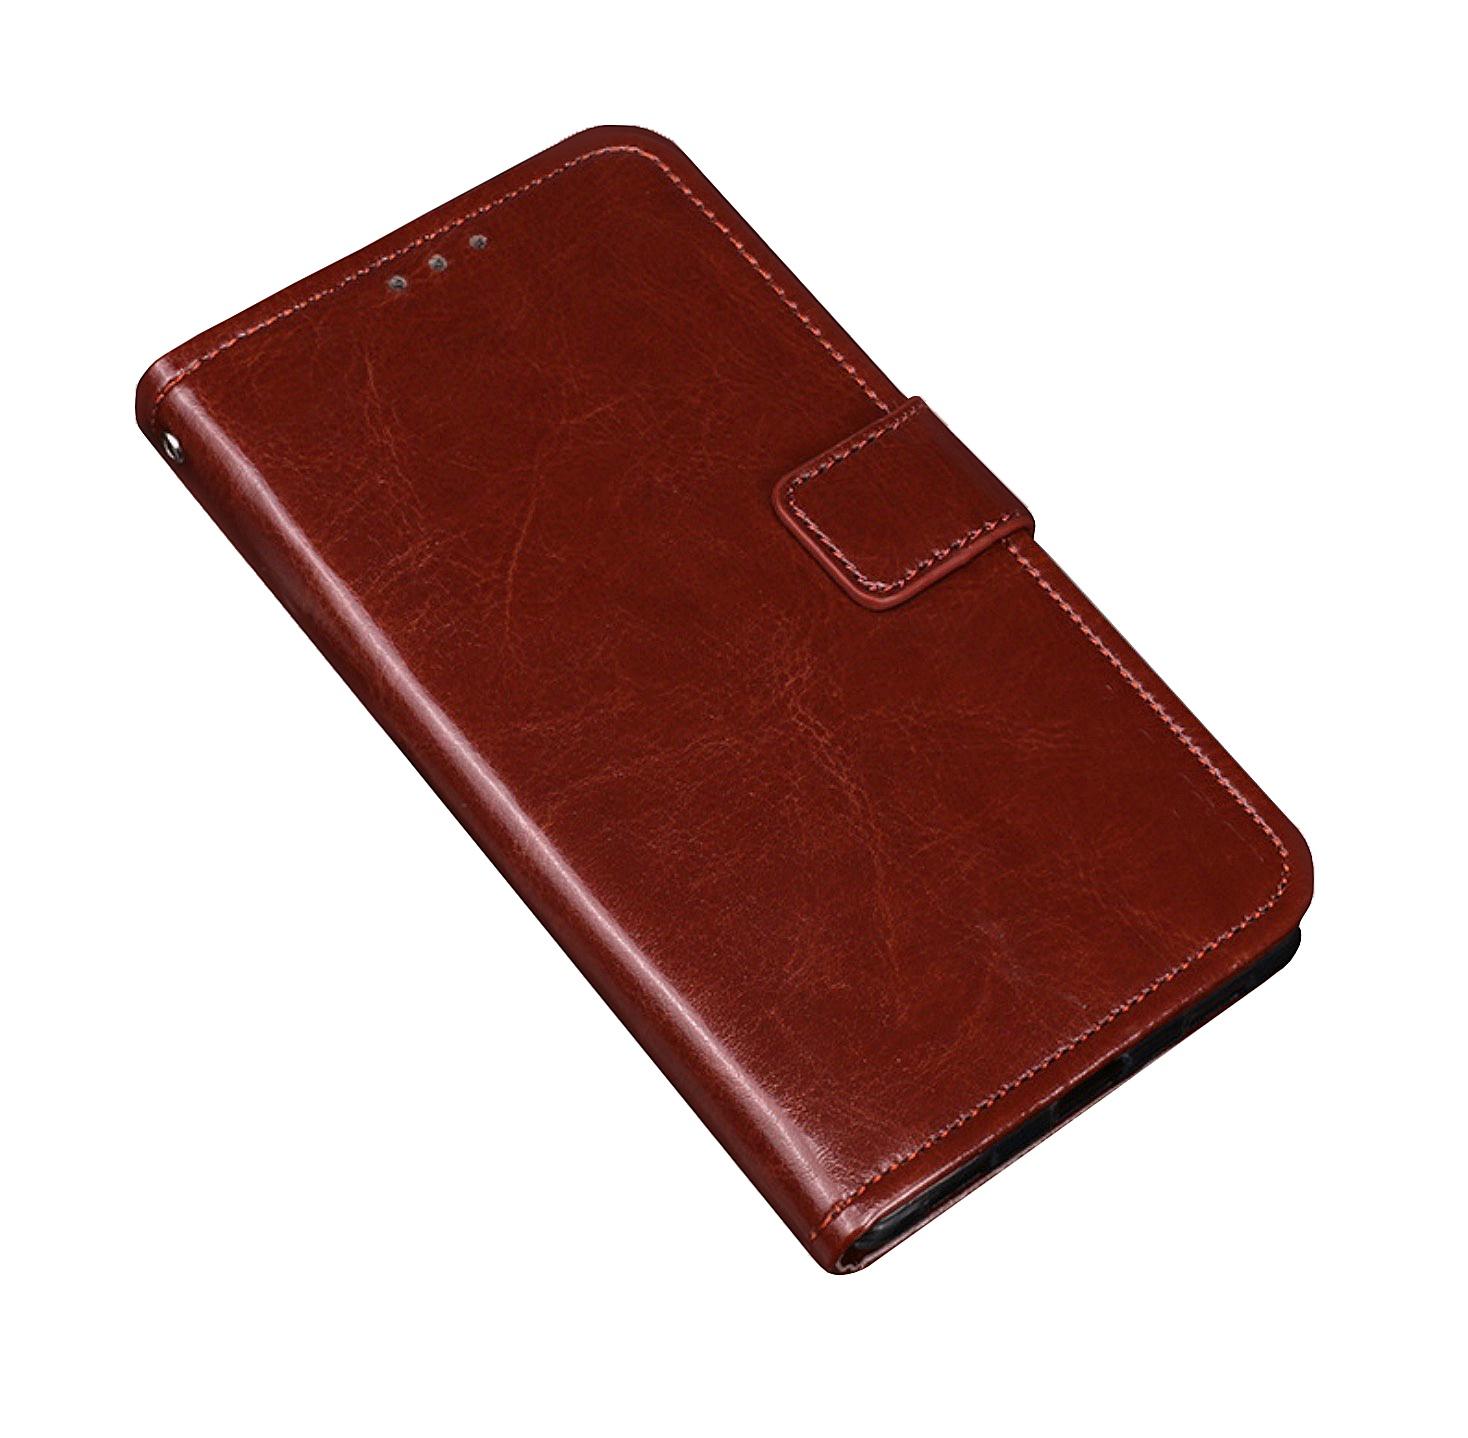 Чехол-книжка MyPads для BQ Mobile BQ-5059 Strike Power с мульти-подставкой застёжкой и визитницей коричневый